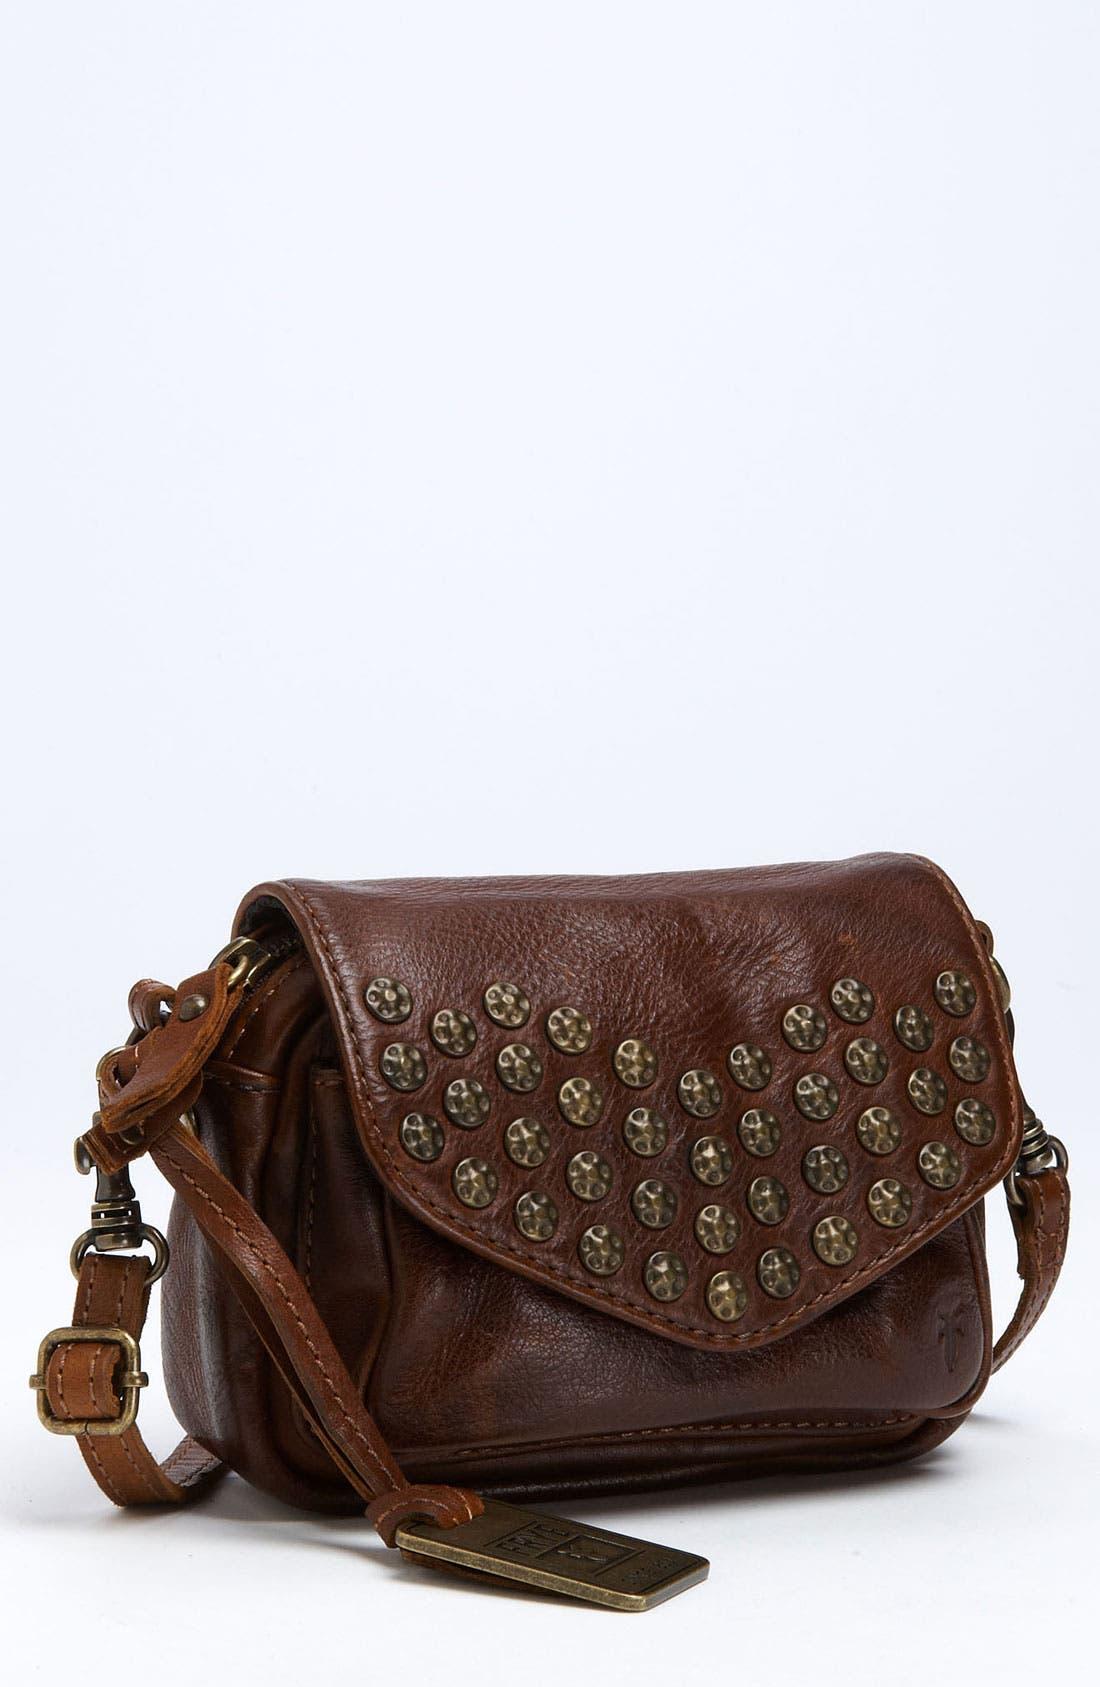 Main Image - Frye 'Brooke - Mini' Crossbody Bag